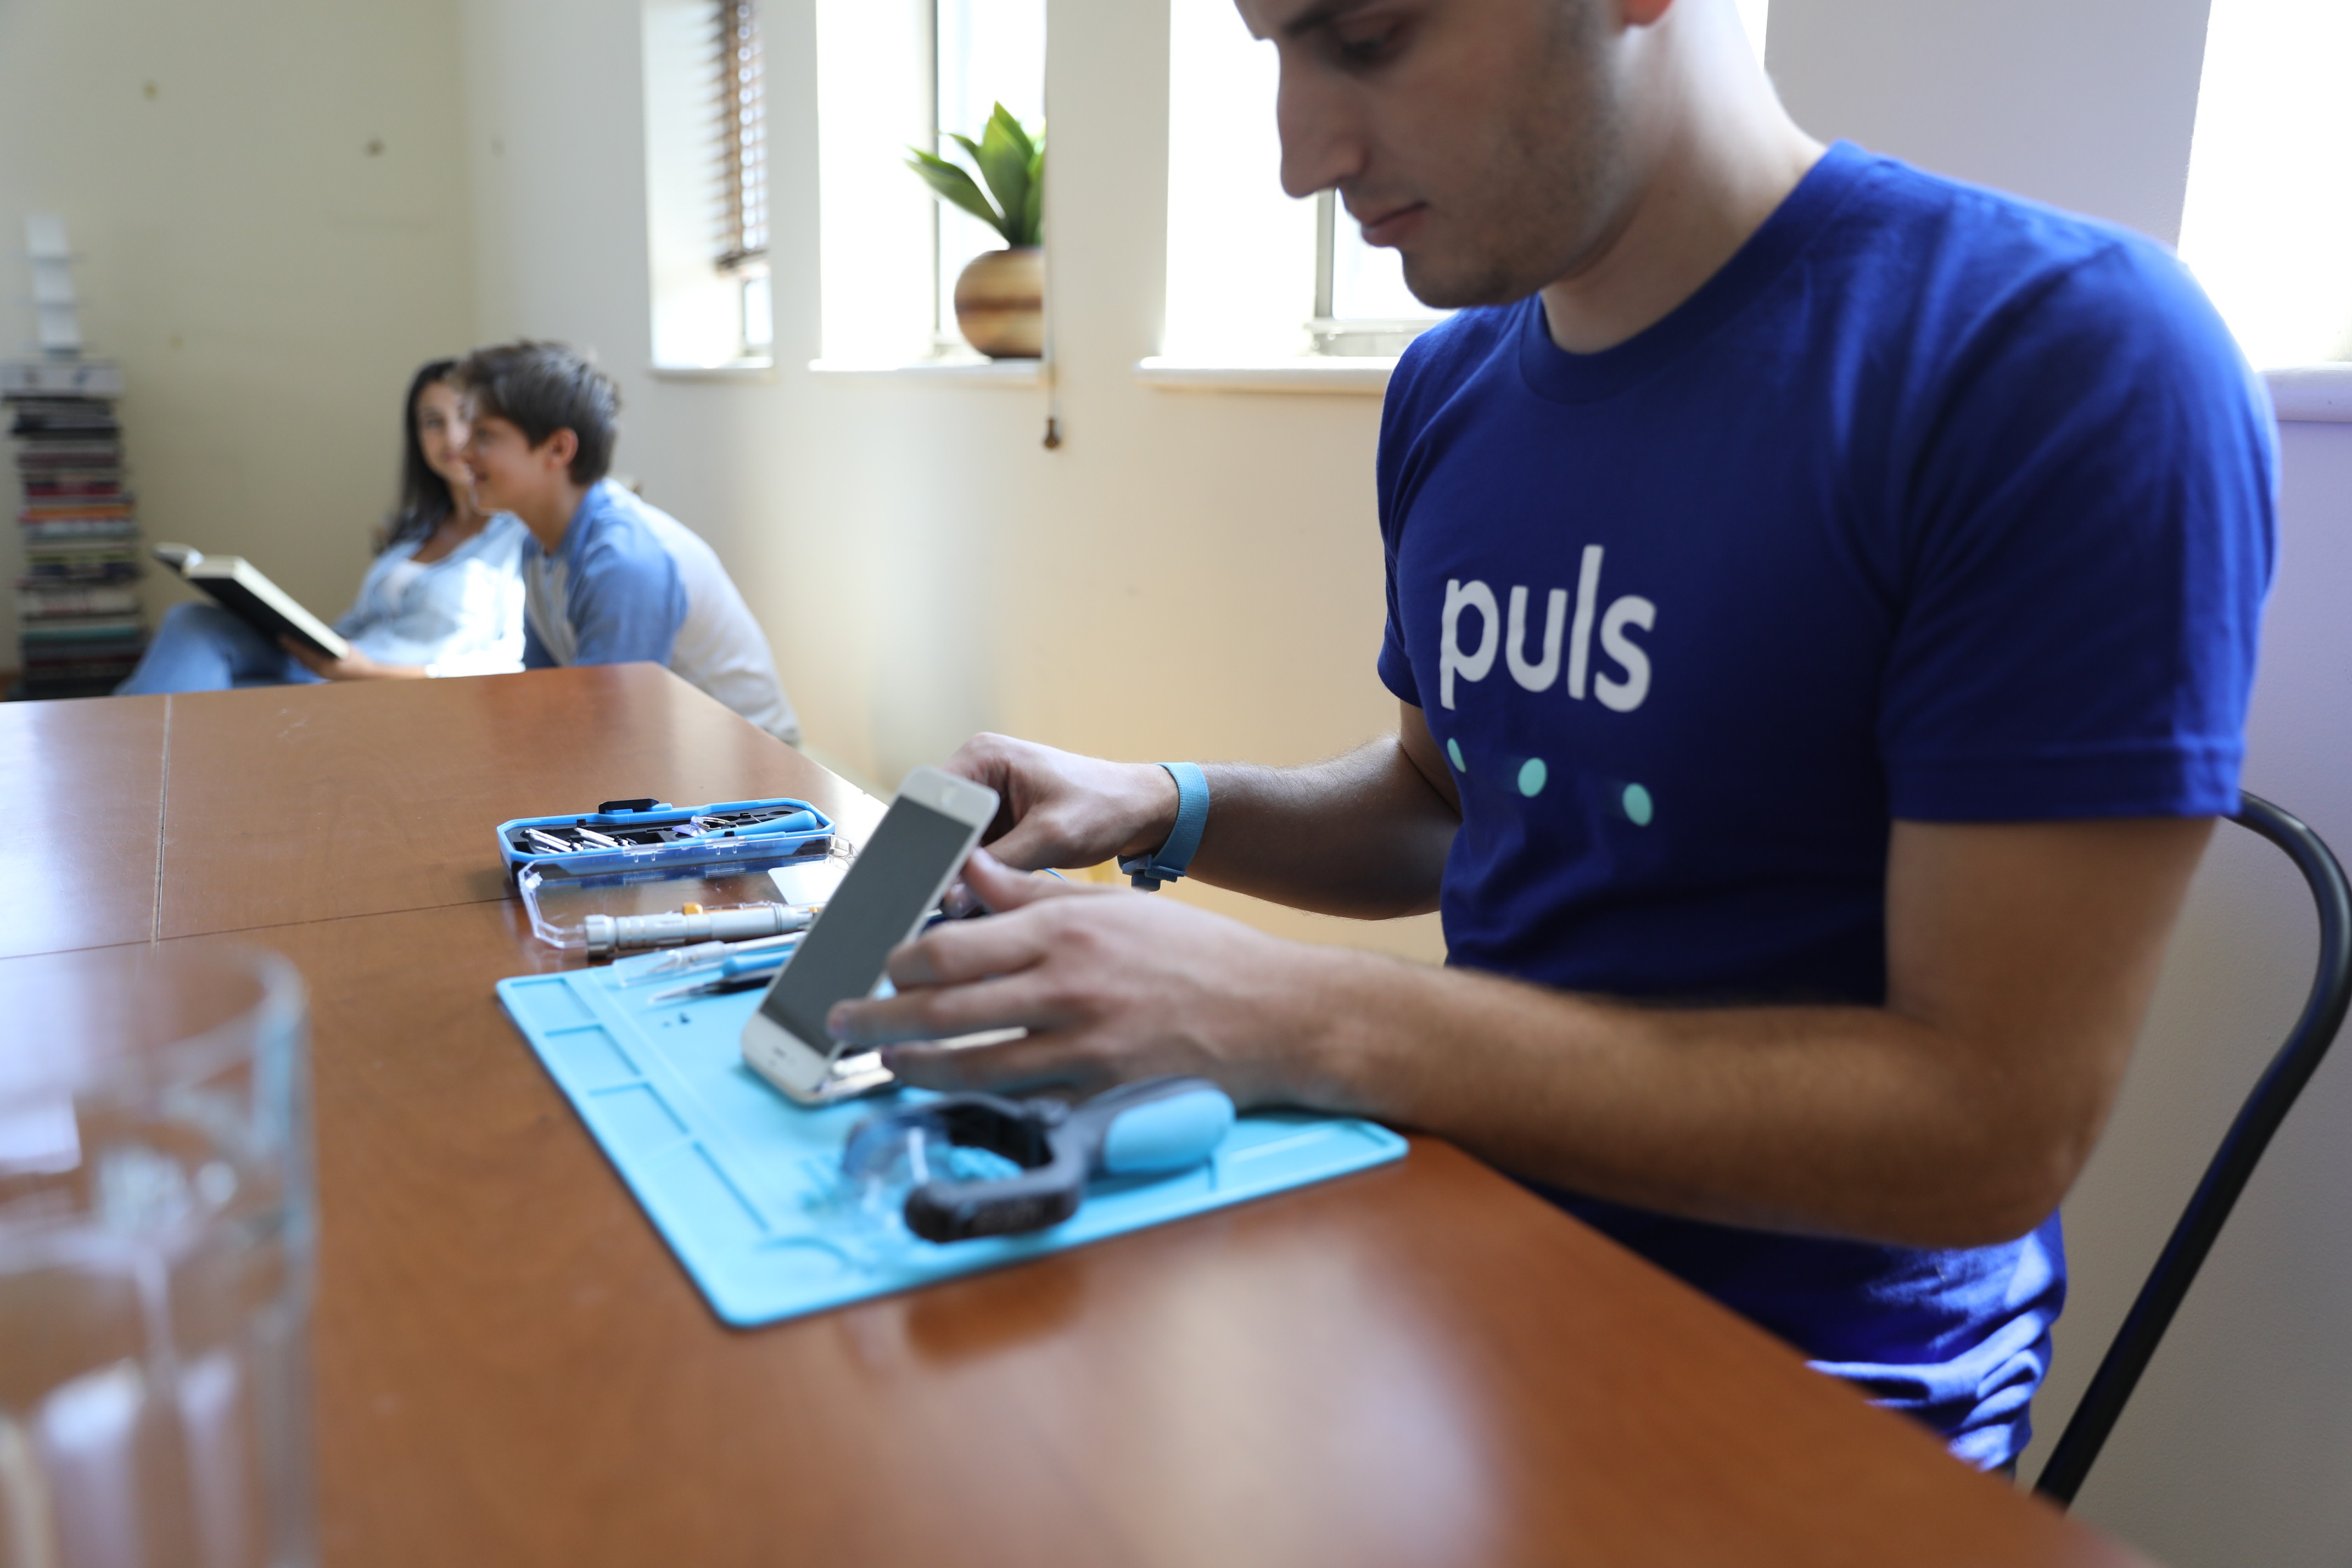 Puls technician fixing an iPhone